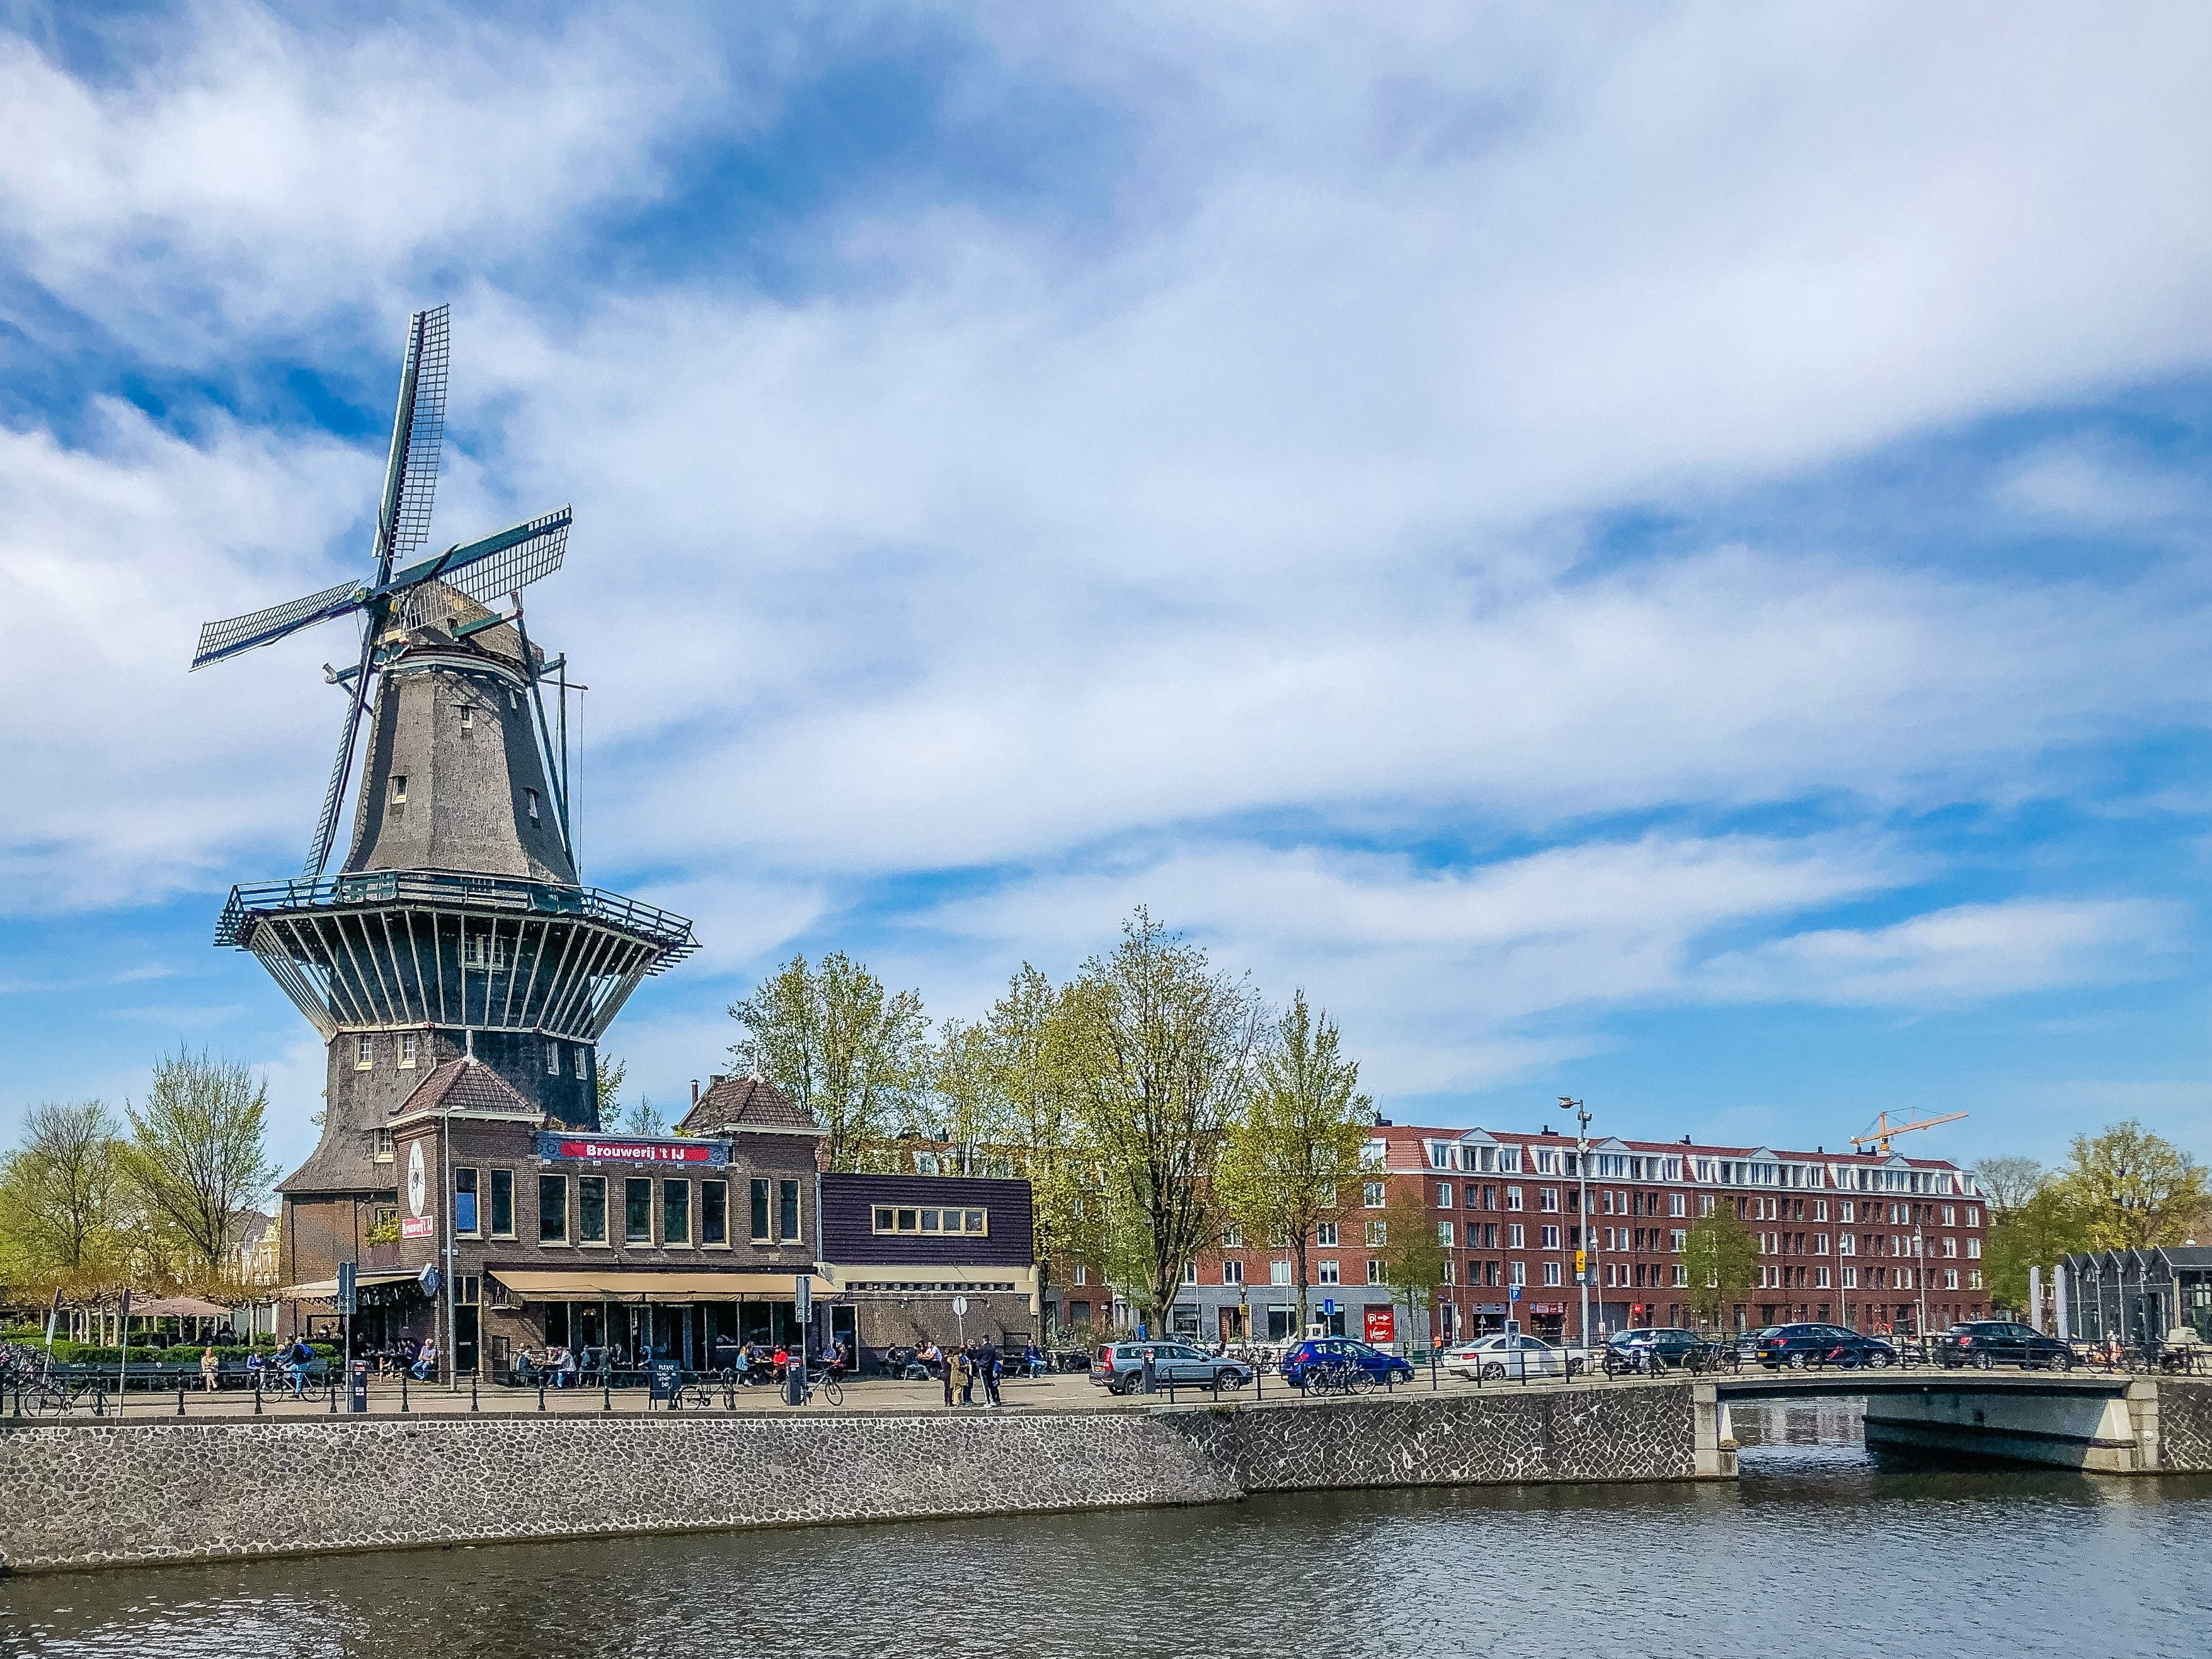 Dapperbuurt, Amsterdam, North Holland, Netherlands